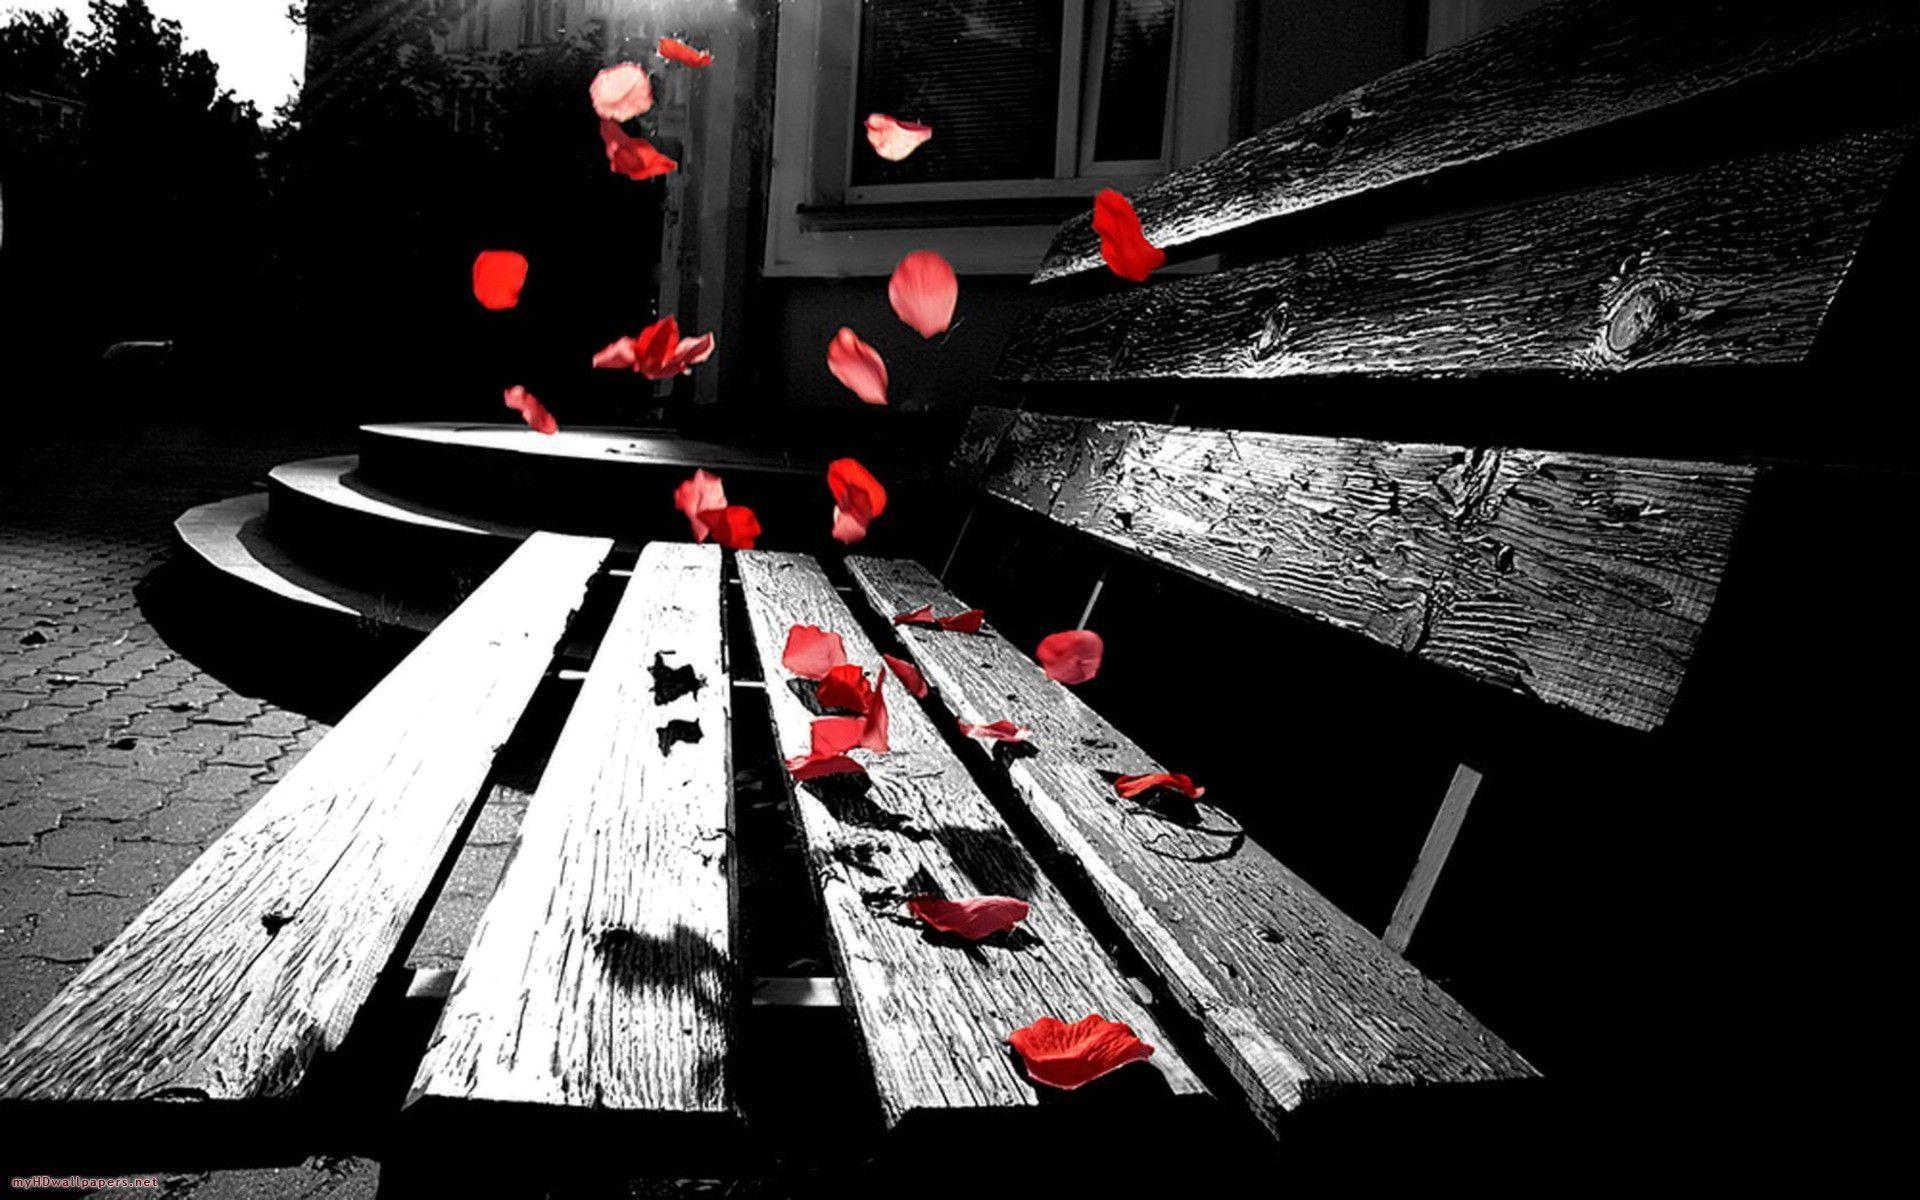 Romantic Backgrounds 55 Images